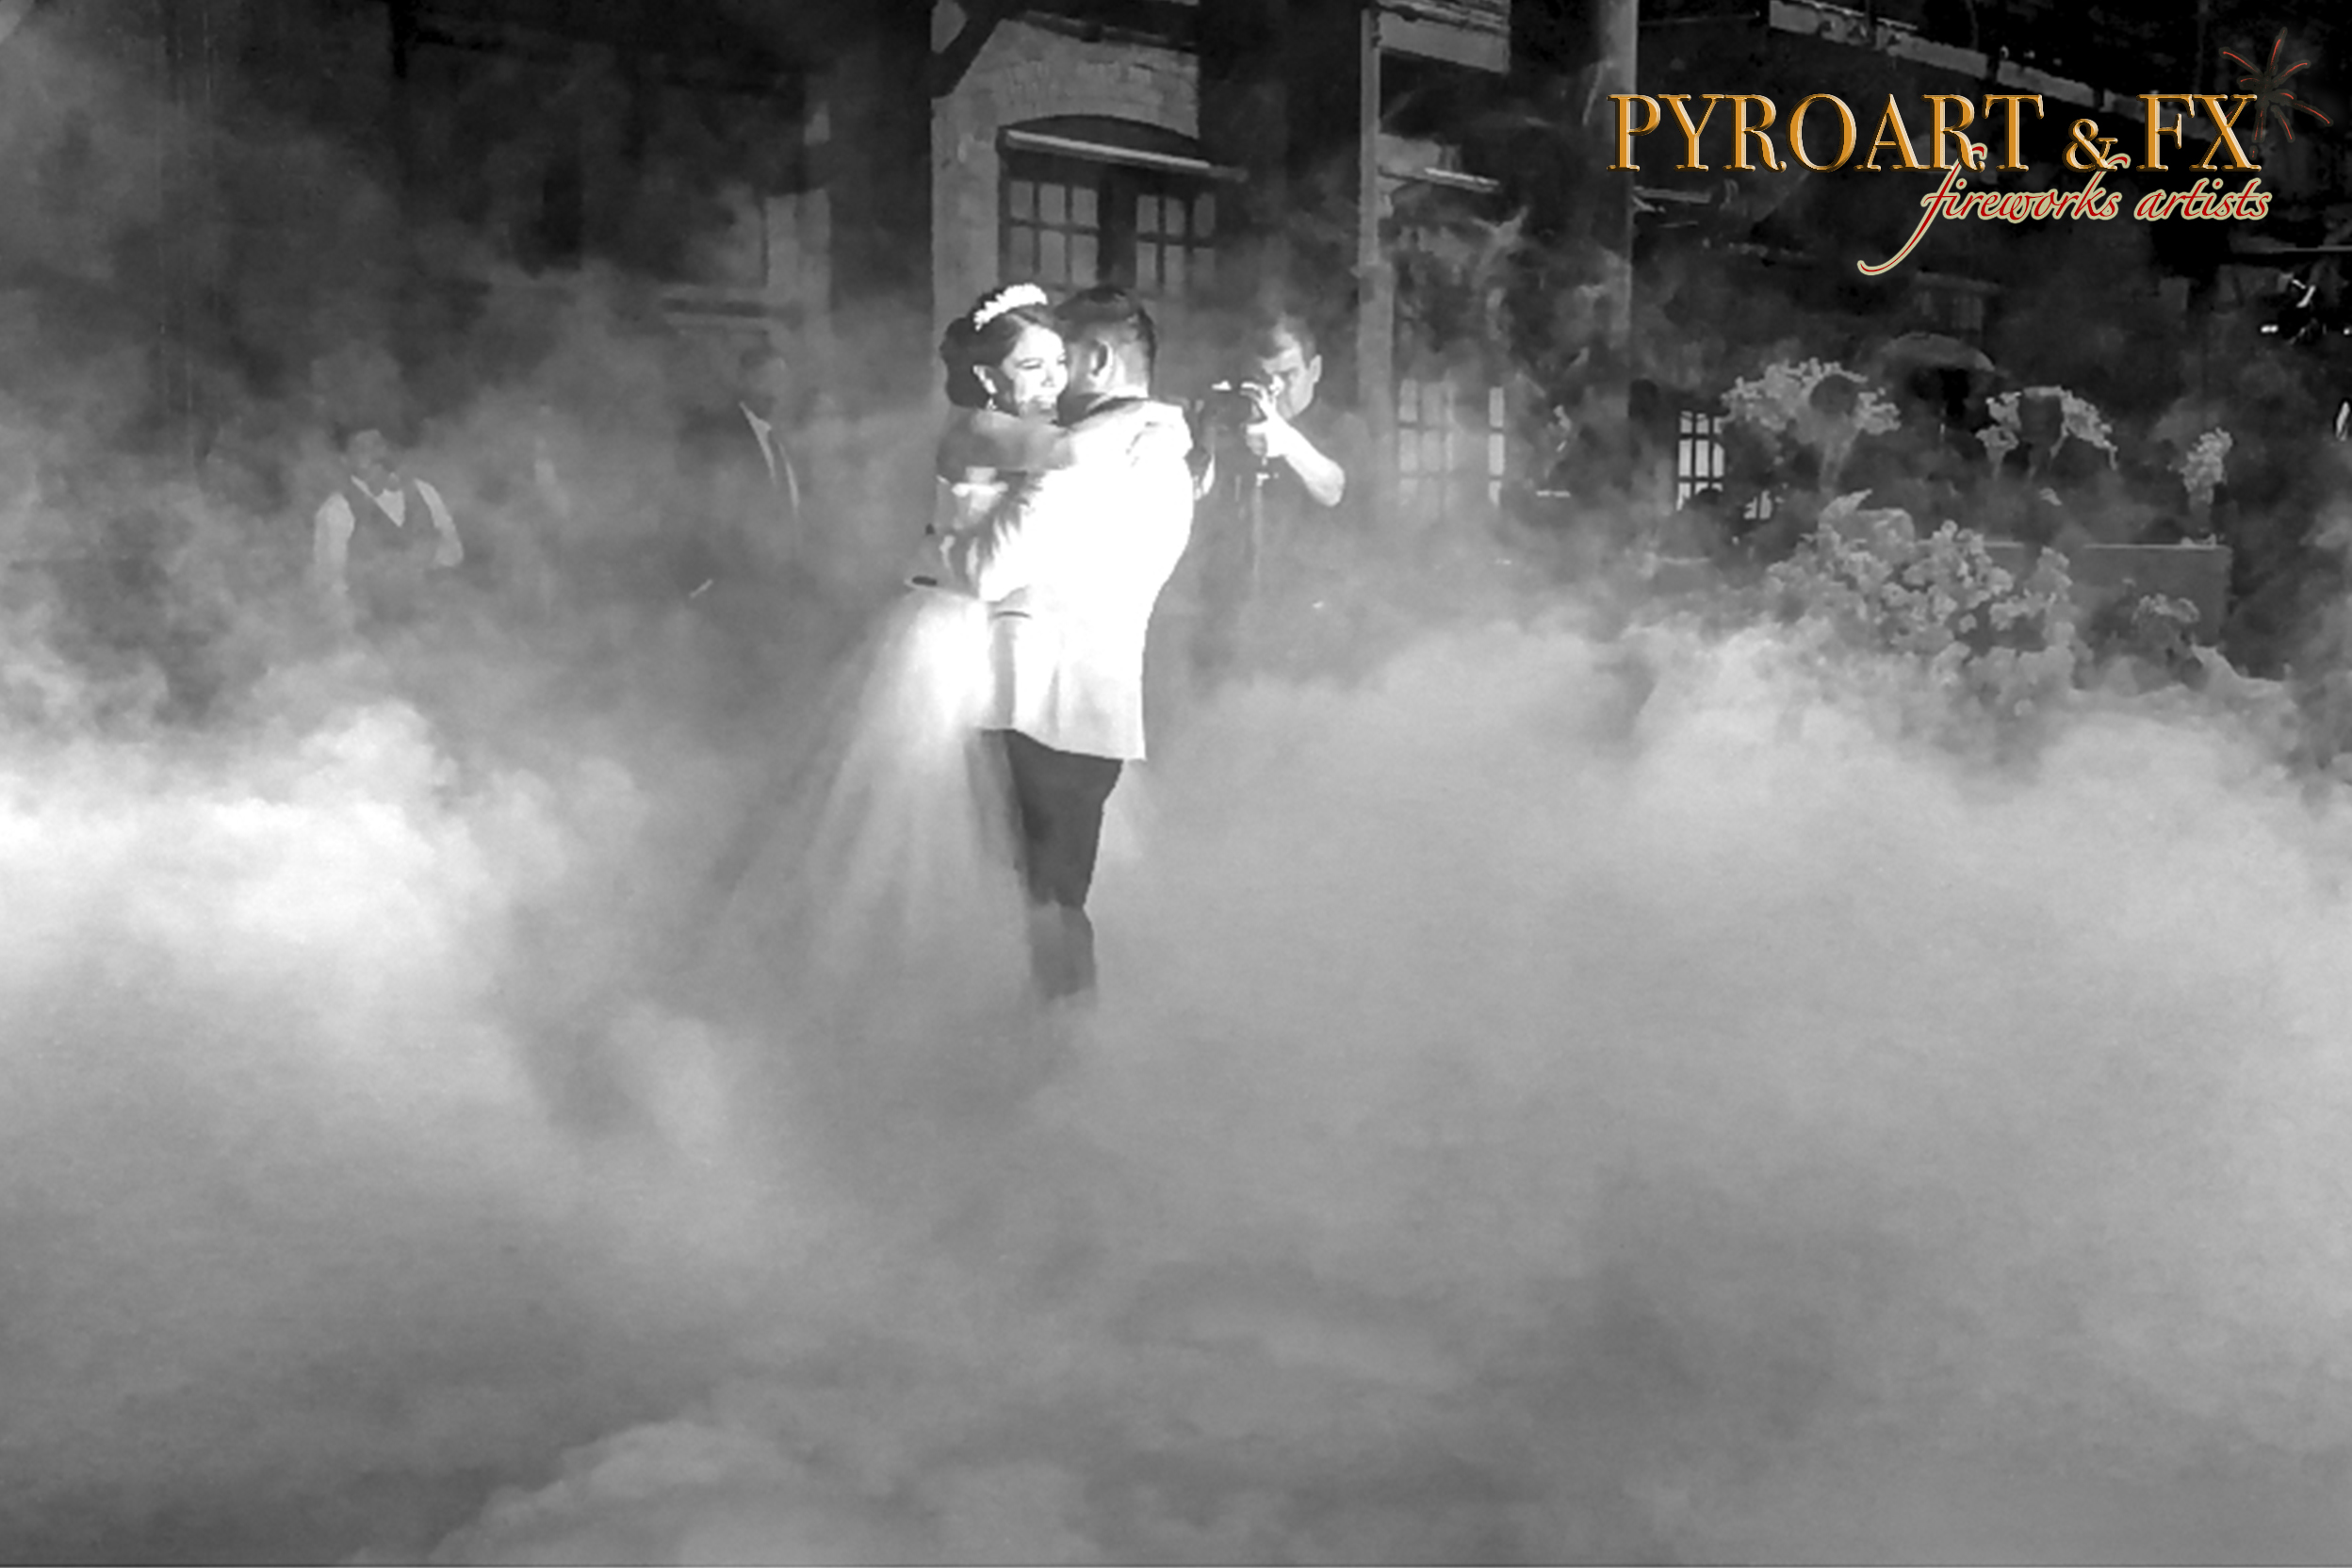 PYROART & FX - B&W SOPLADORES